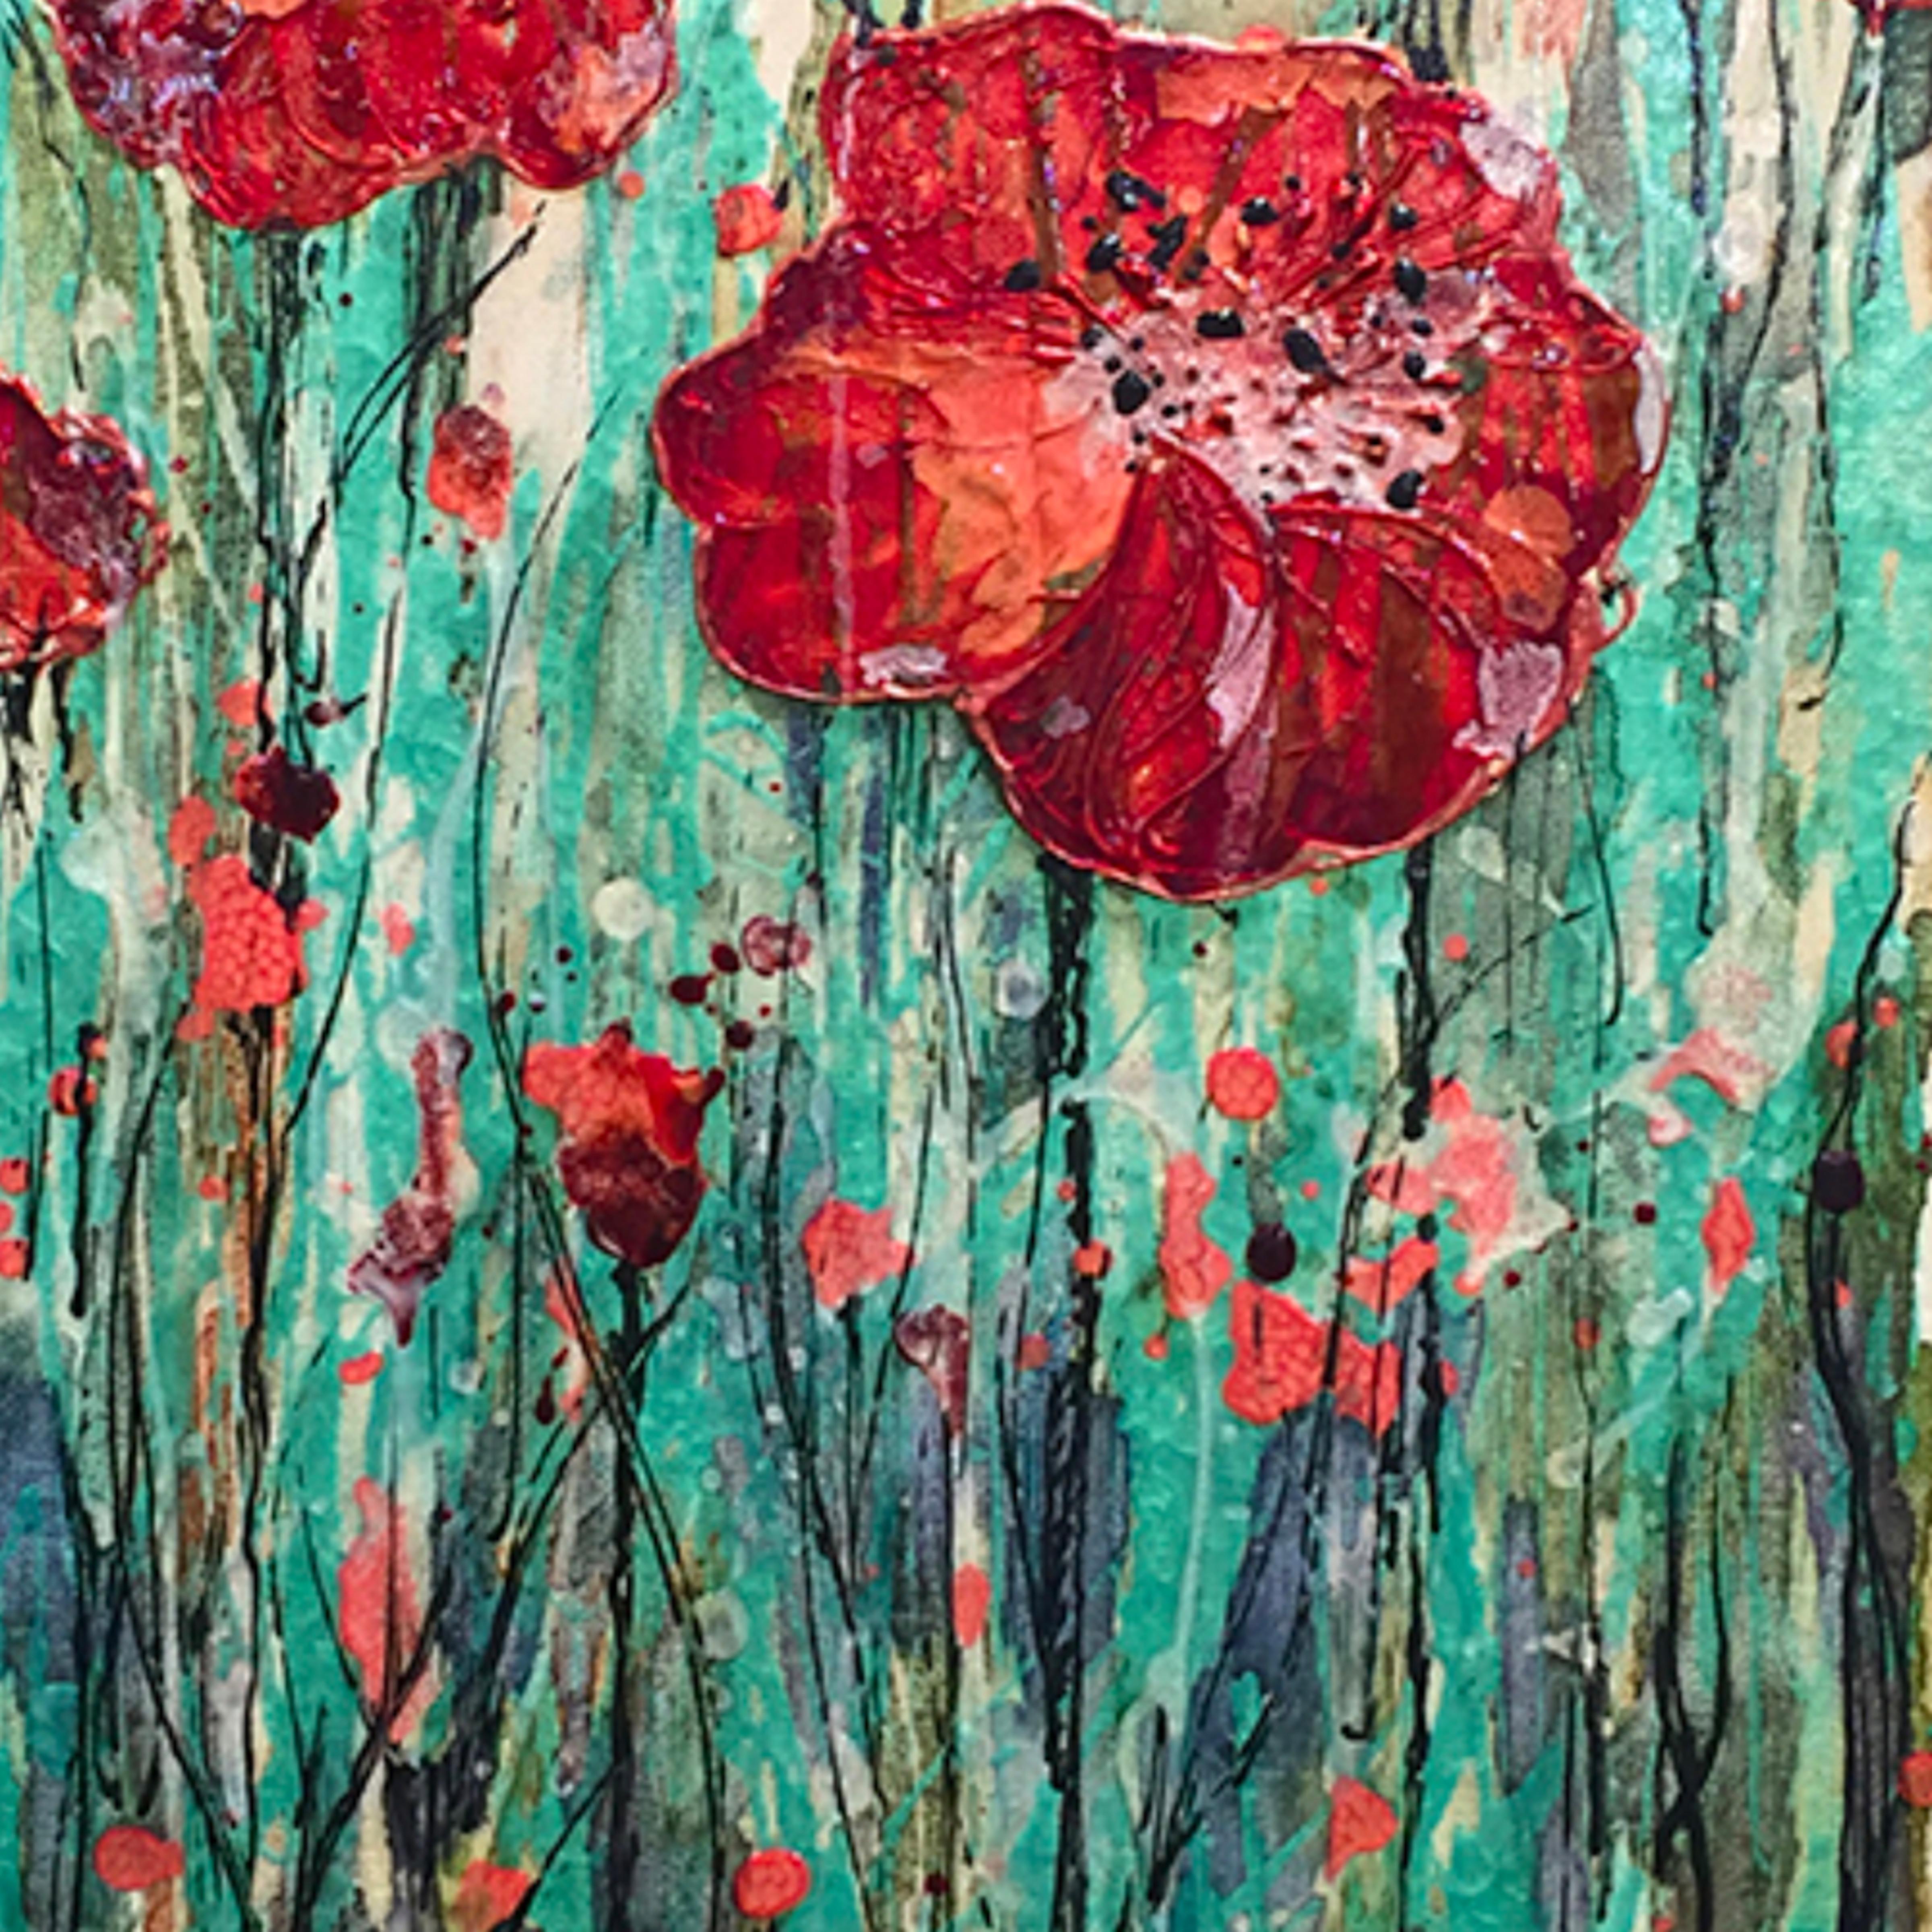 Poppy flower vertical sejcvq